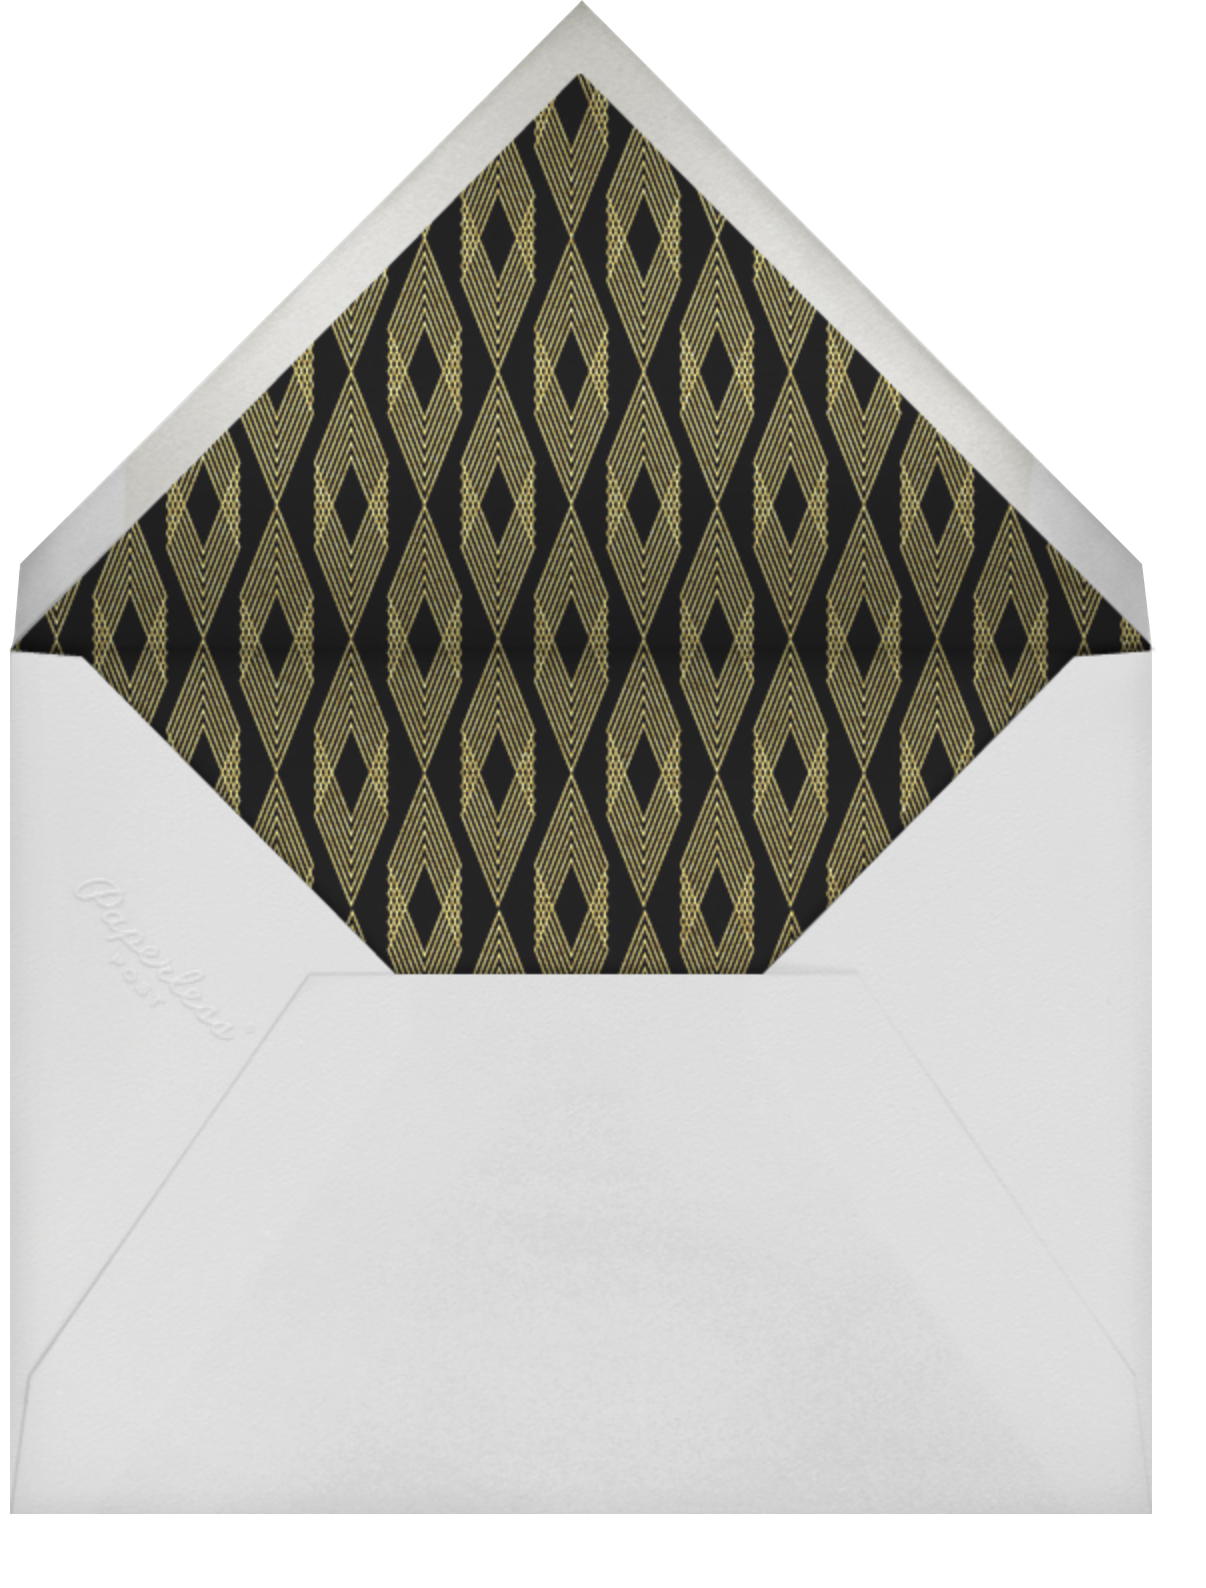 Fa Lalala La  (4 Photos) - Gold - Paperless Post - Holiday cards - envelope back